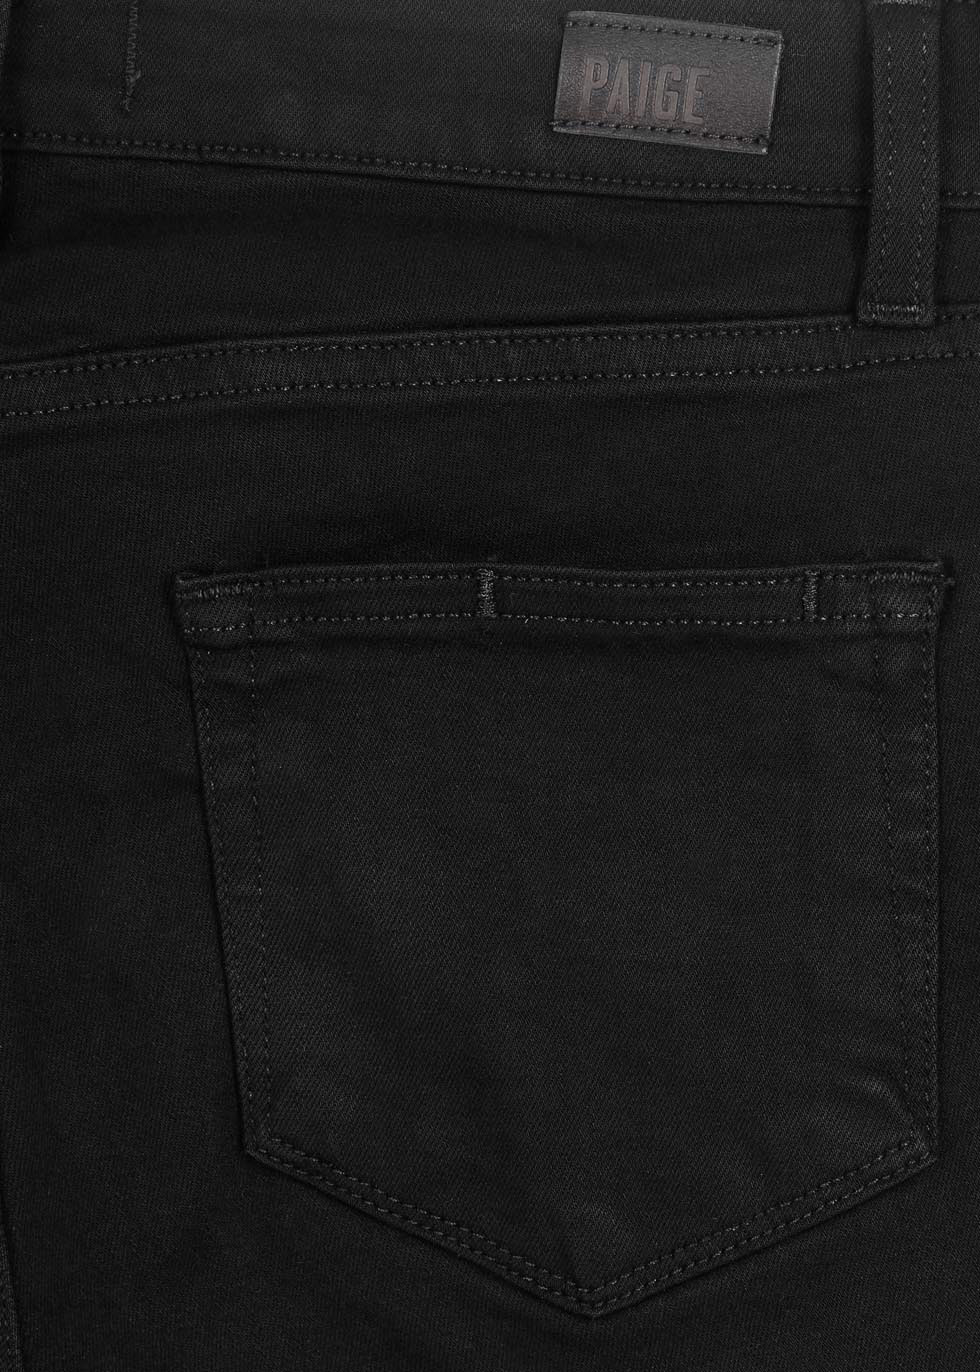 Hoxton Transcend black skinny jeans - Paige